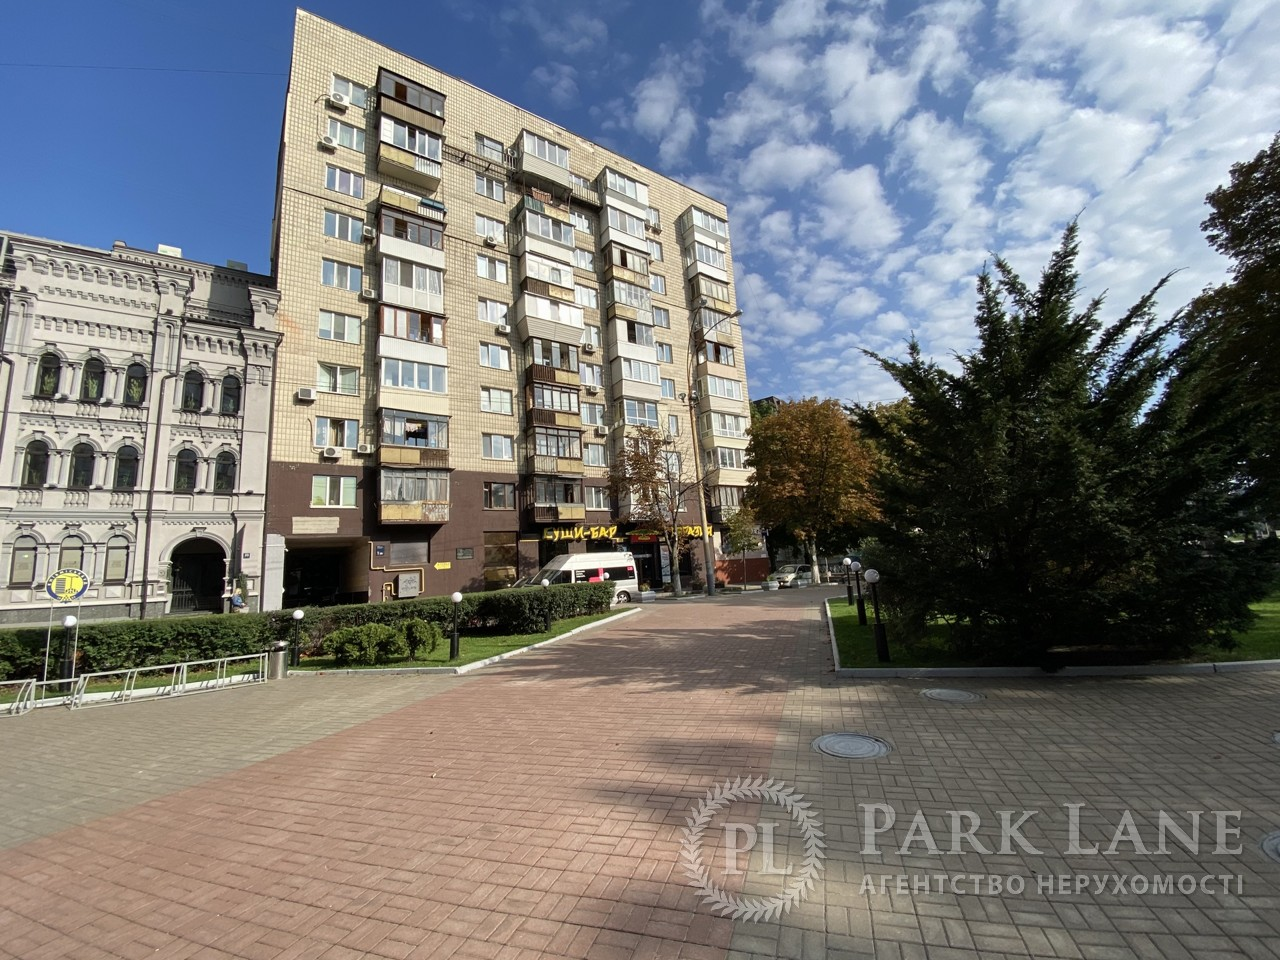 Квартира Z-793327, Никольский пер. (Январский пер.), 1/25, Киев - Фото 1